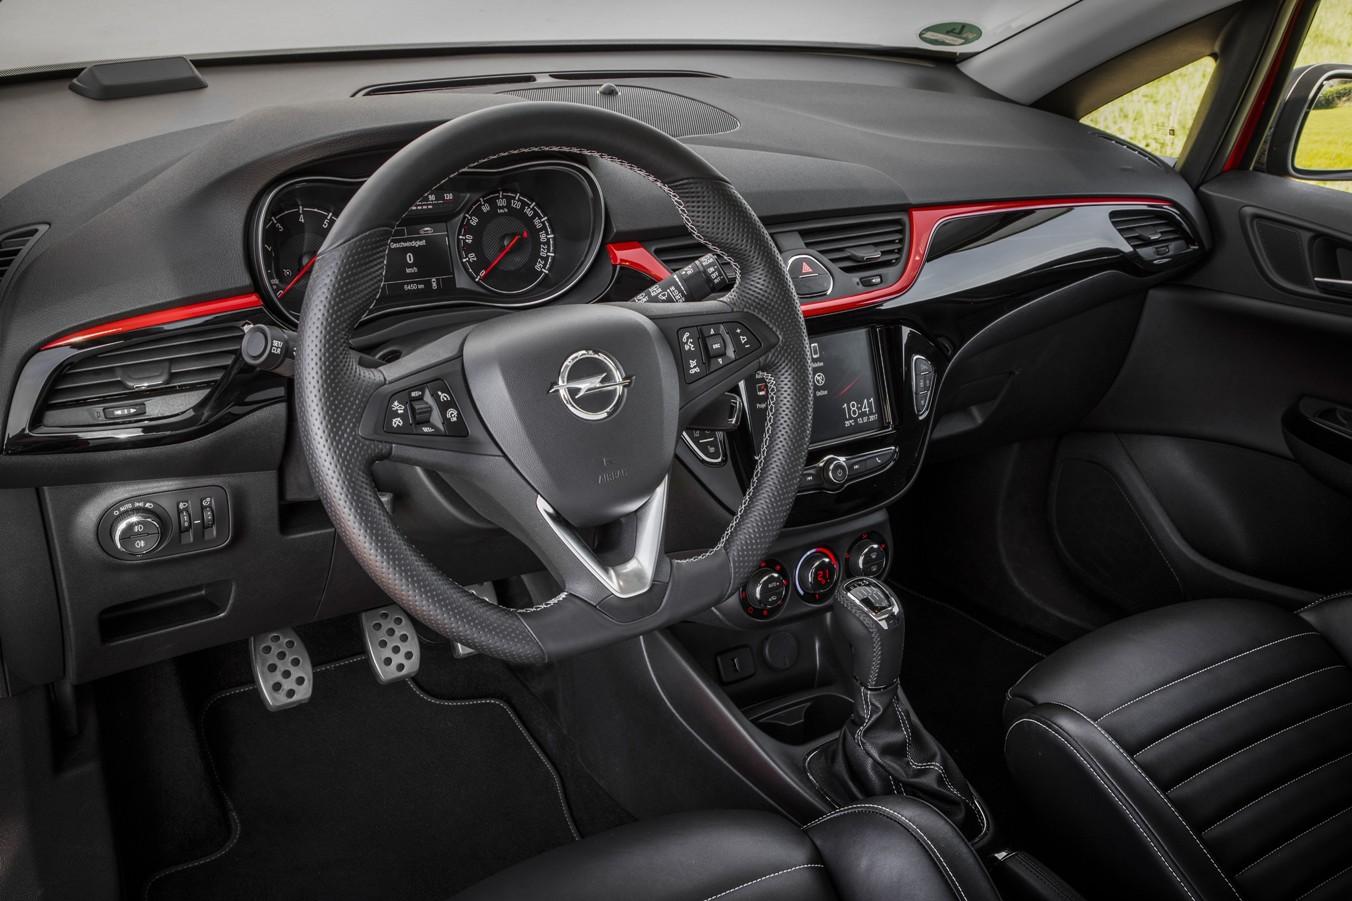 Opel Corsa S: 150 CV para ir abriendo boca